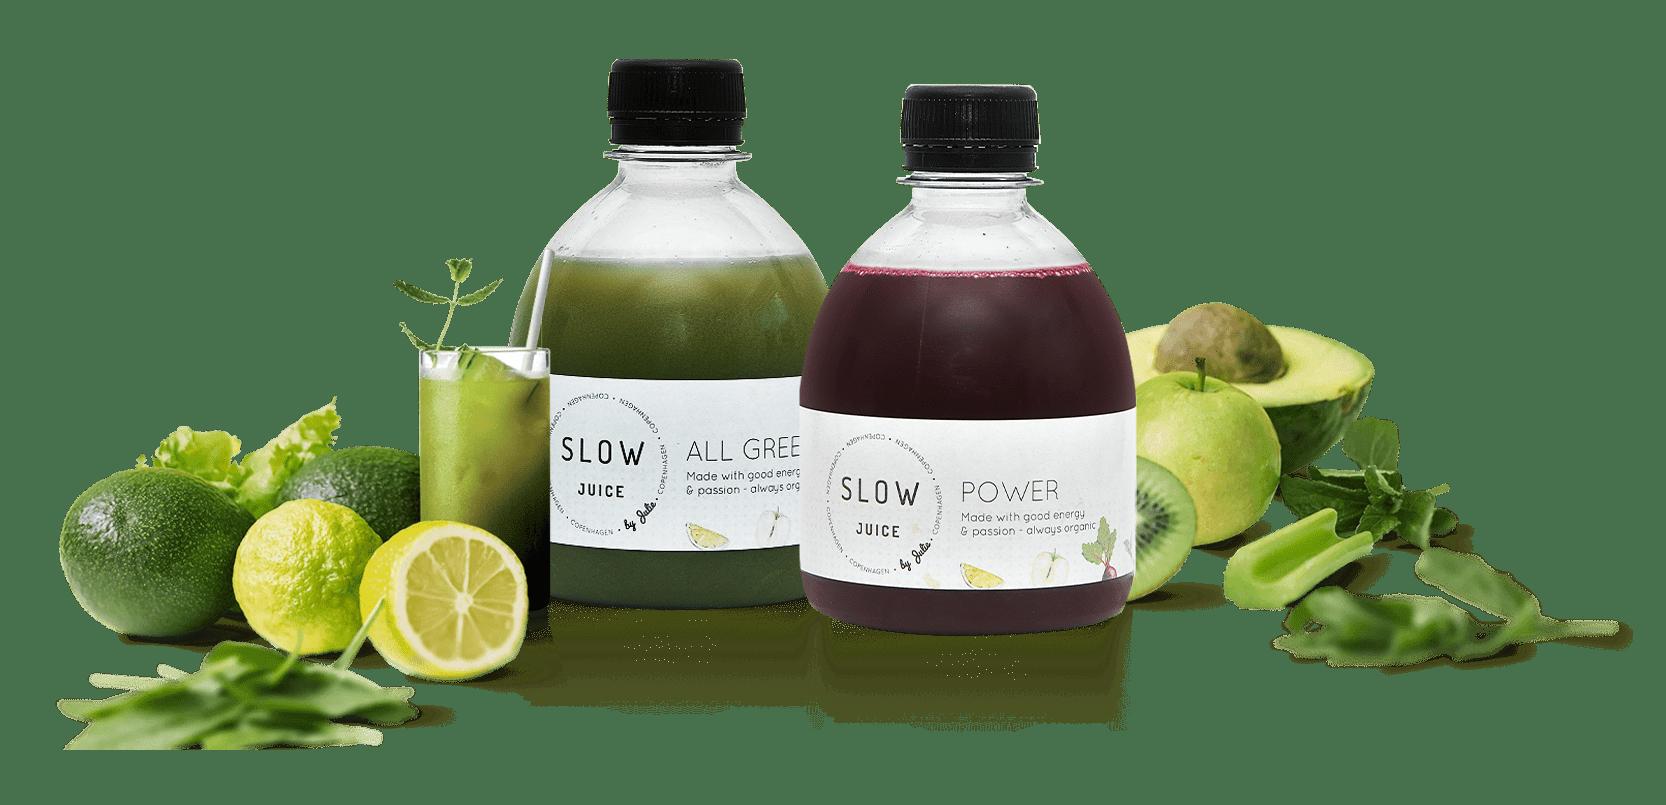 Økologiske juicekurer